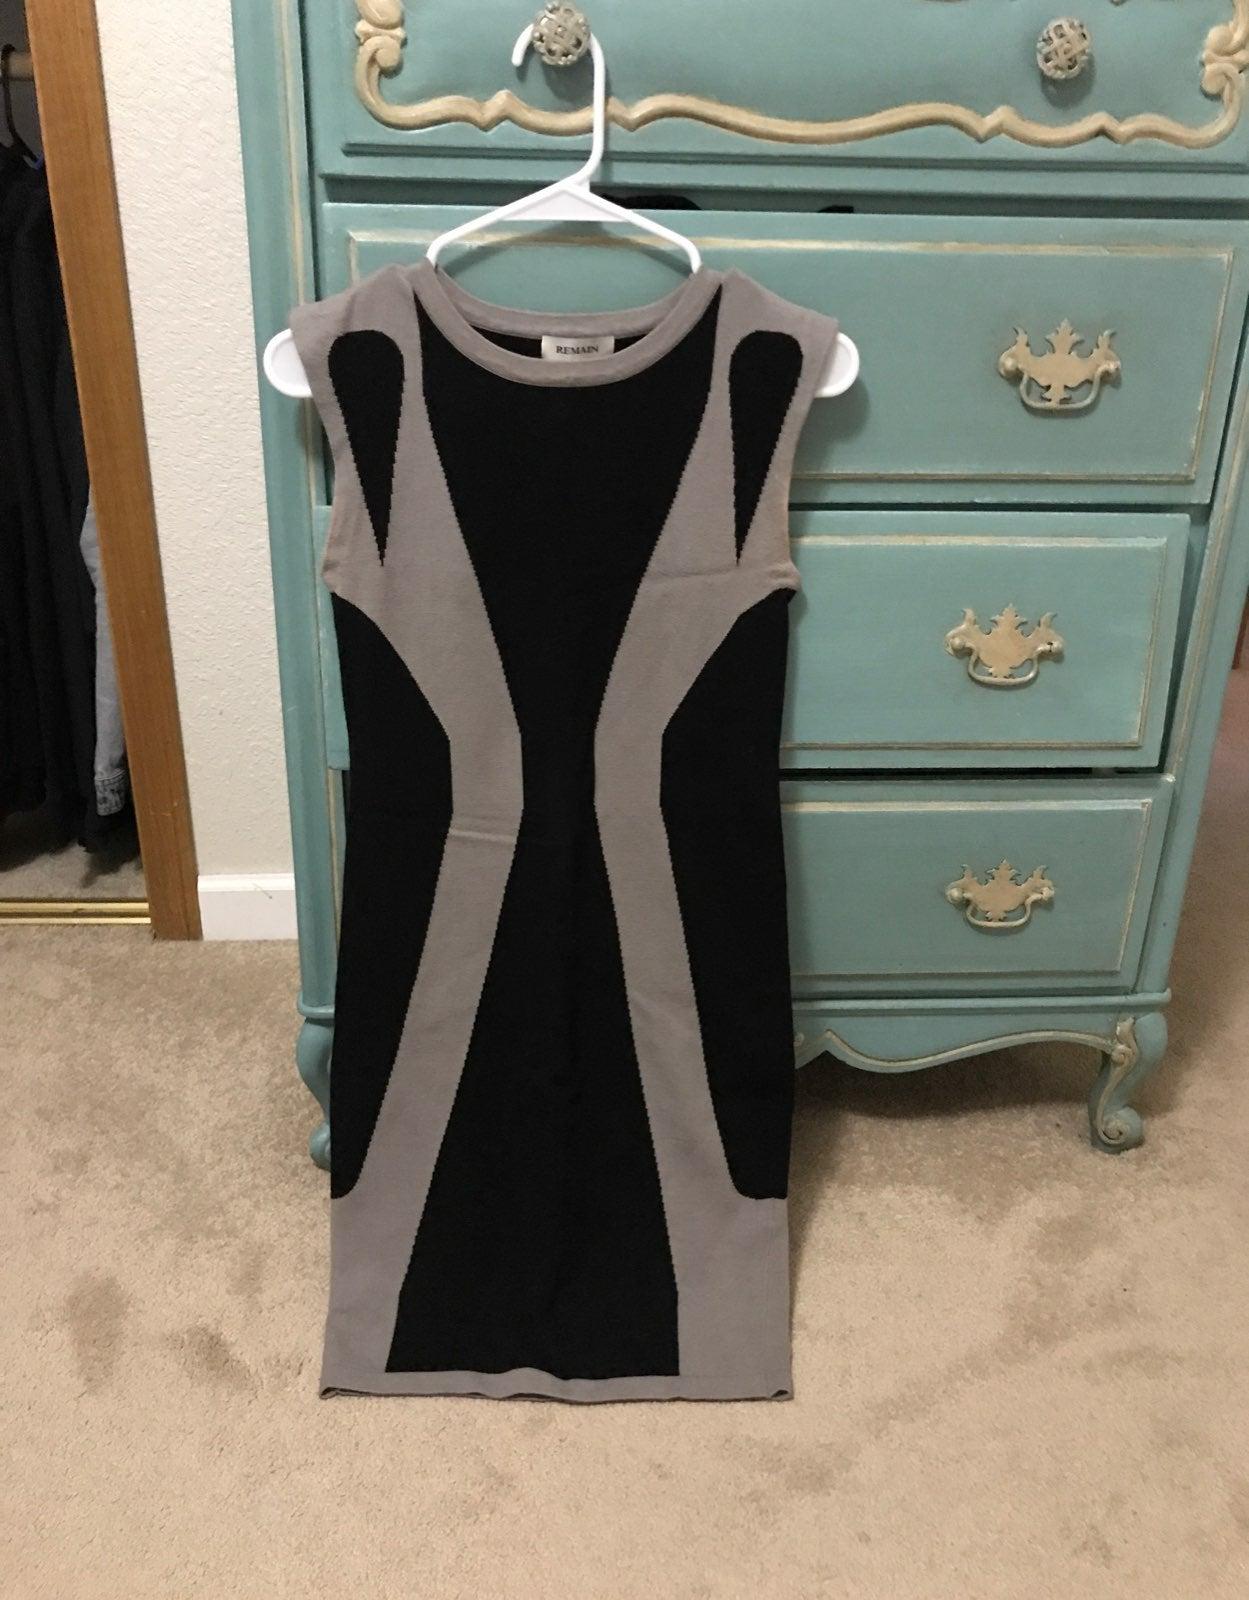 Remain sweater dress size small